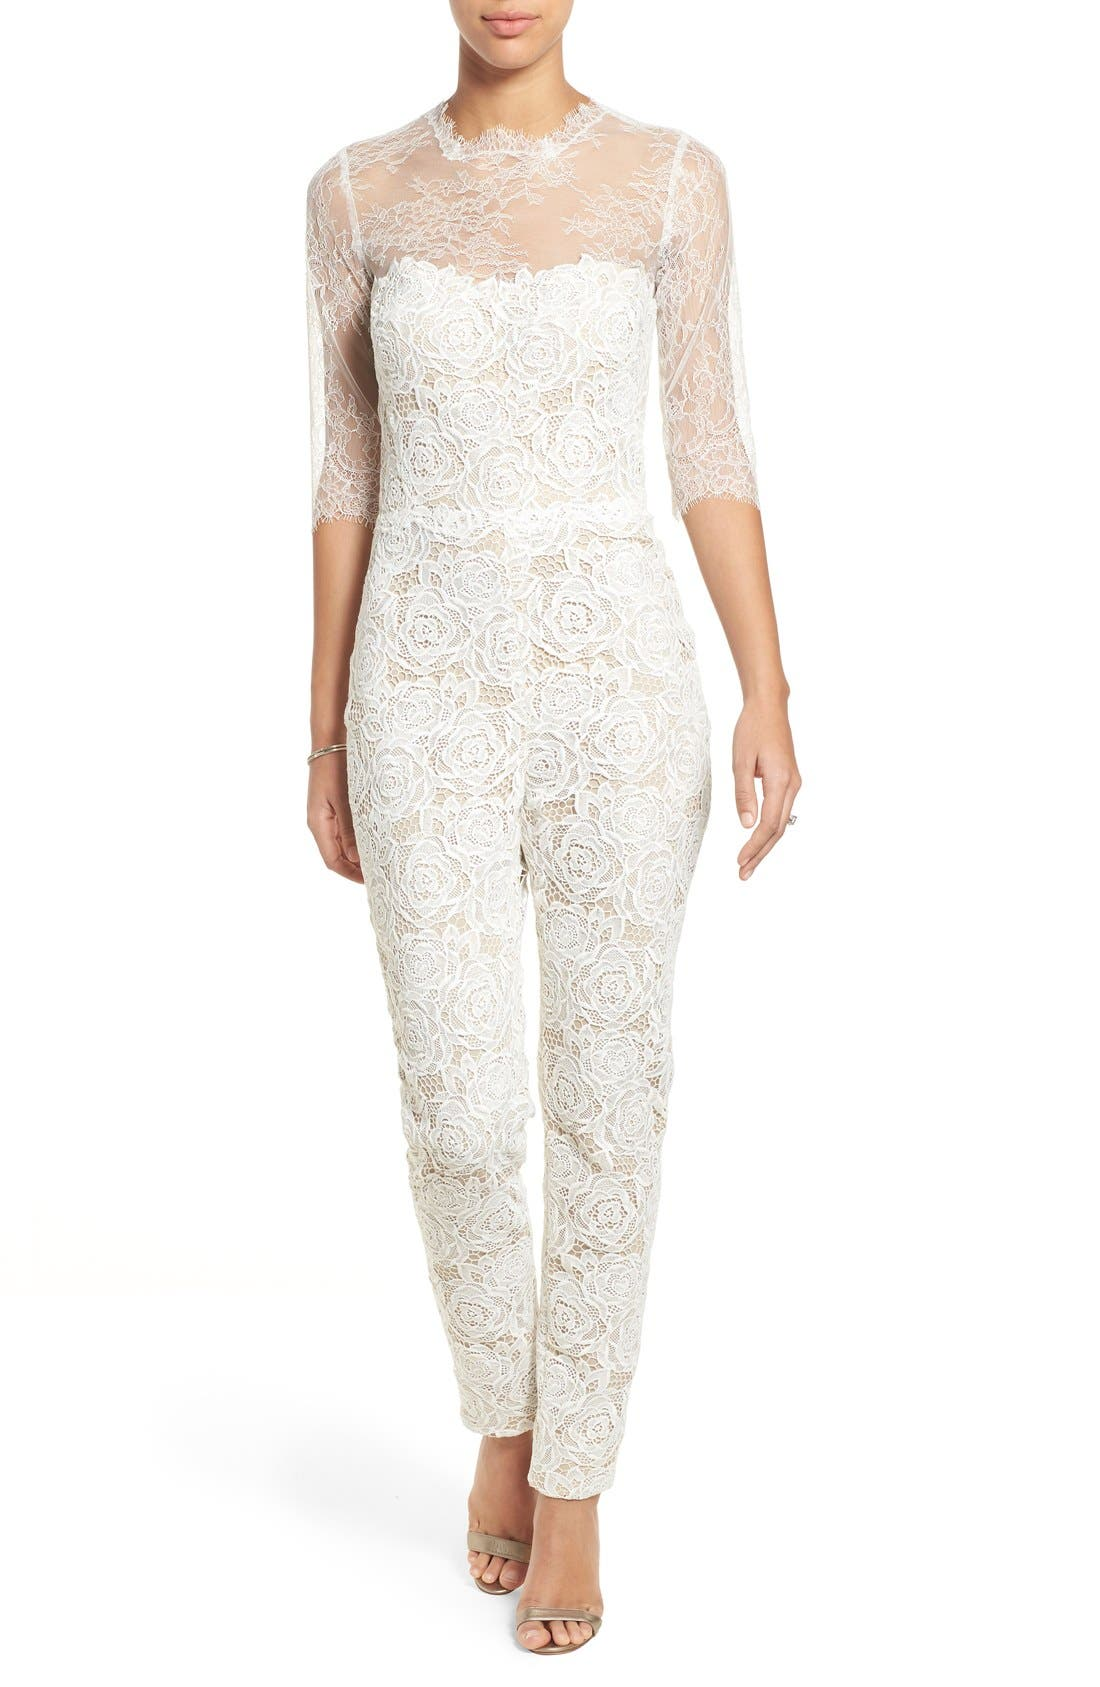 Monique Lhuillier Ready to Wed Guipure Lace Jumpsuit